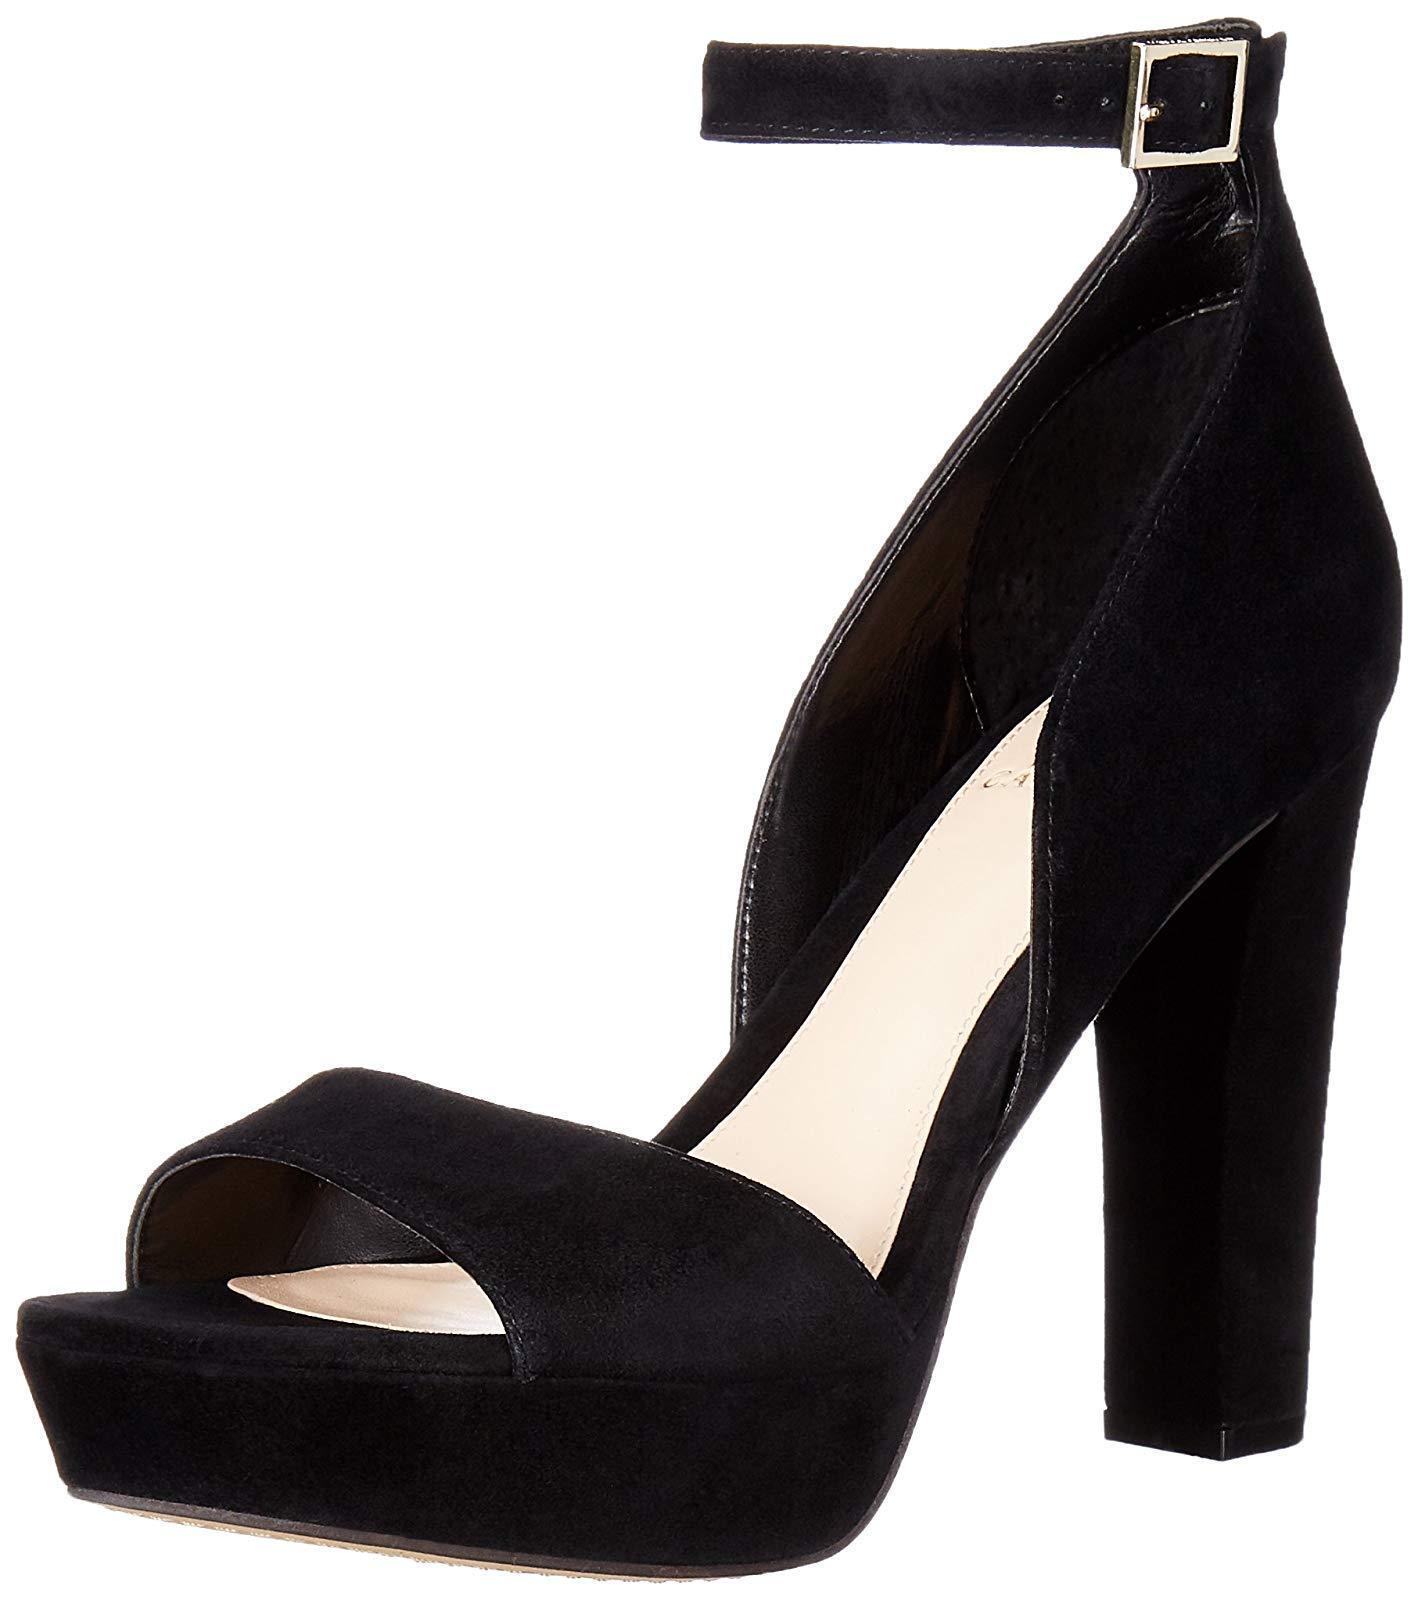 9.5M VINCE CAMUTO Sakari Black True Suede Sandals Open Toe Women Platform shoes